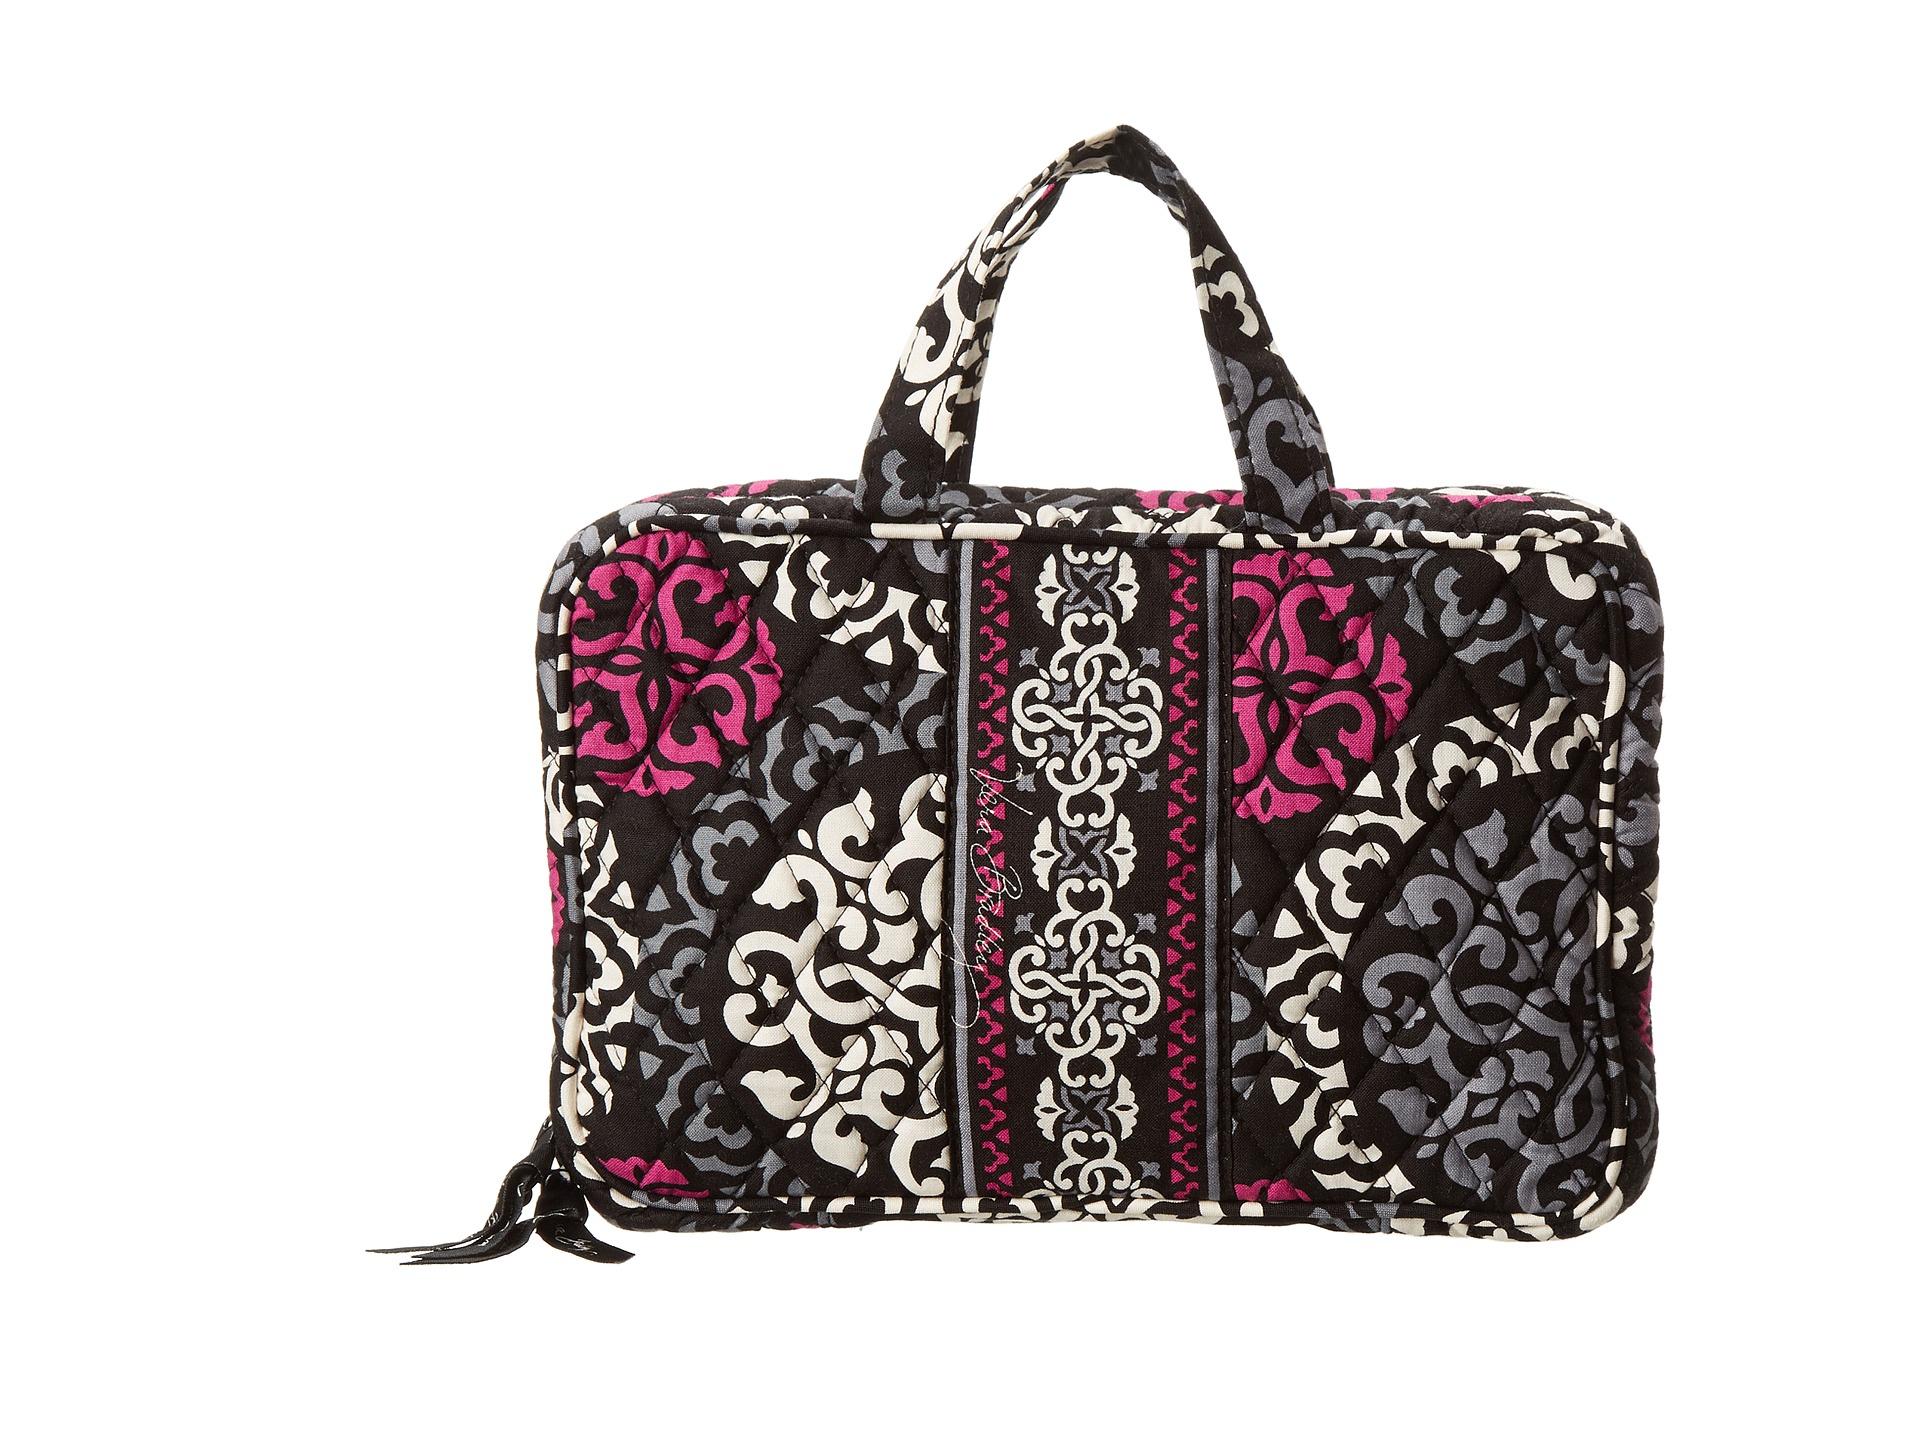 Vera Bradley Hanging Travel Cosmetic Bag